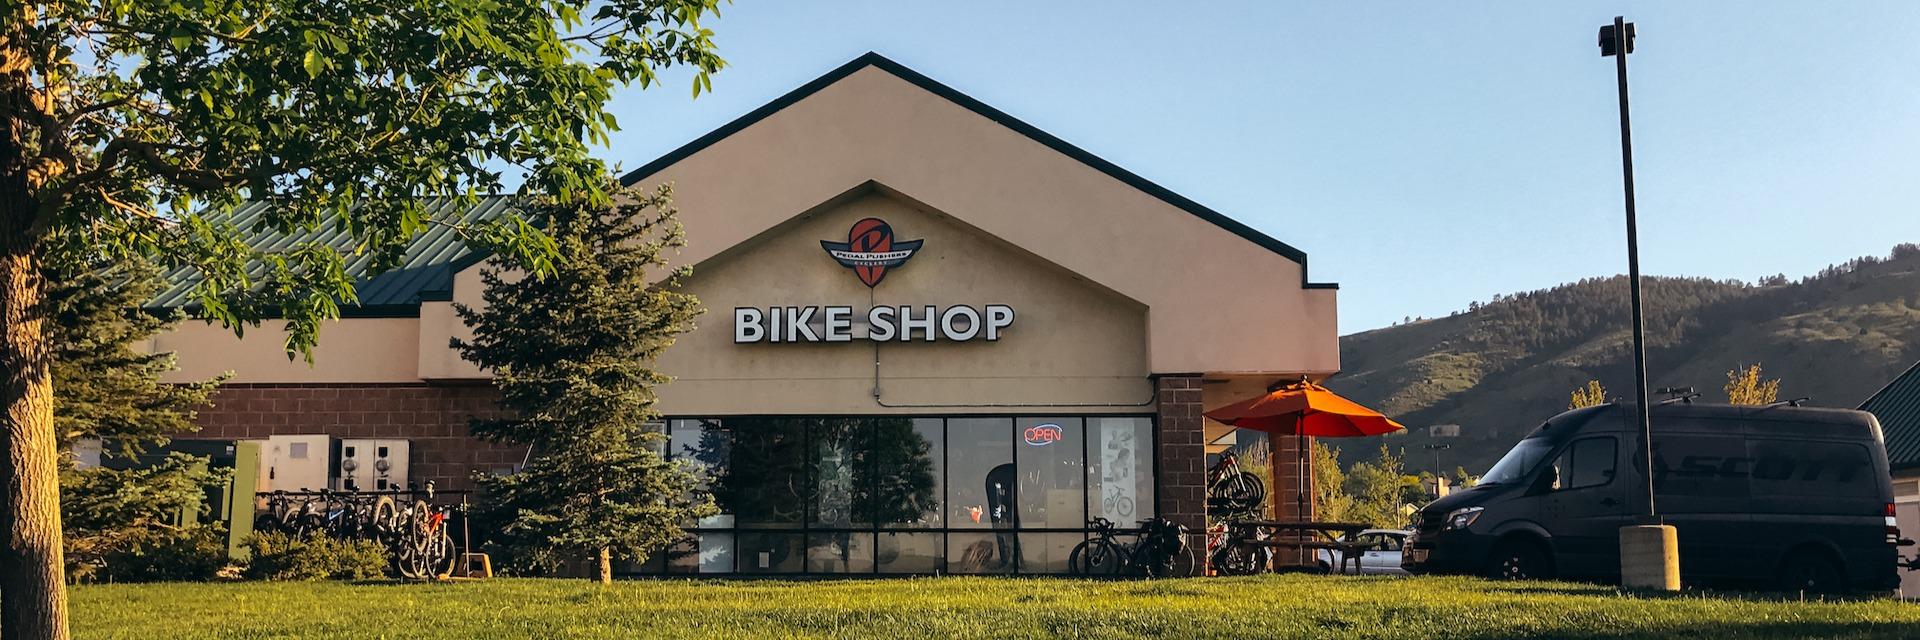 Pedal Pushers Cyclery Bike Shop